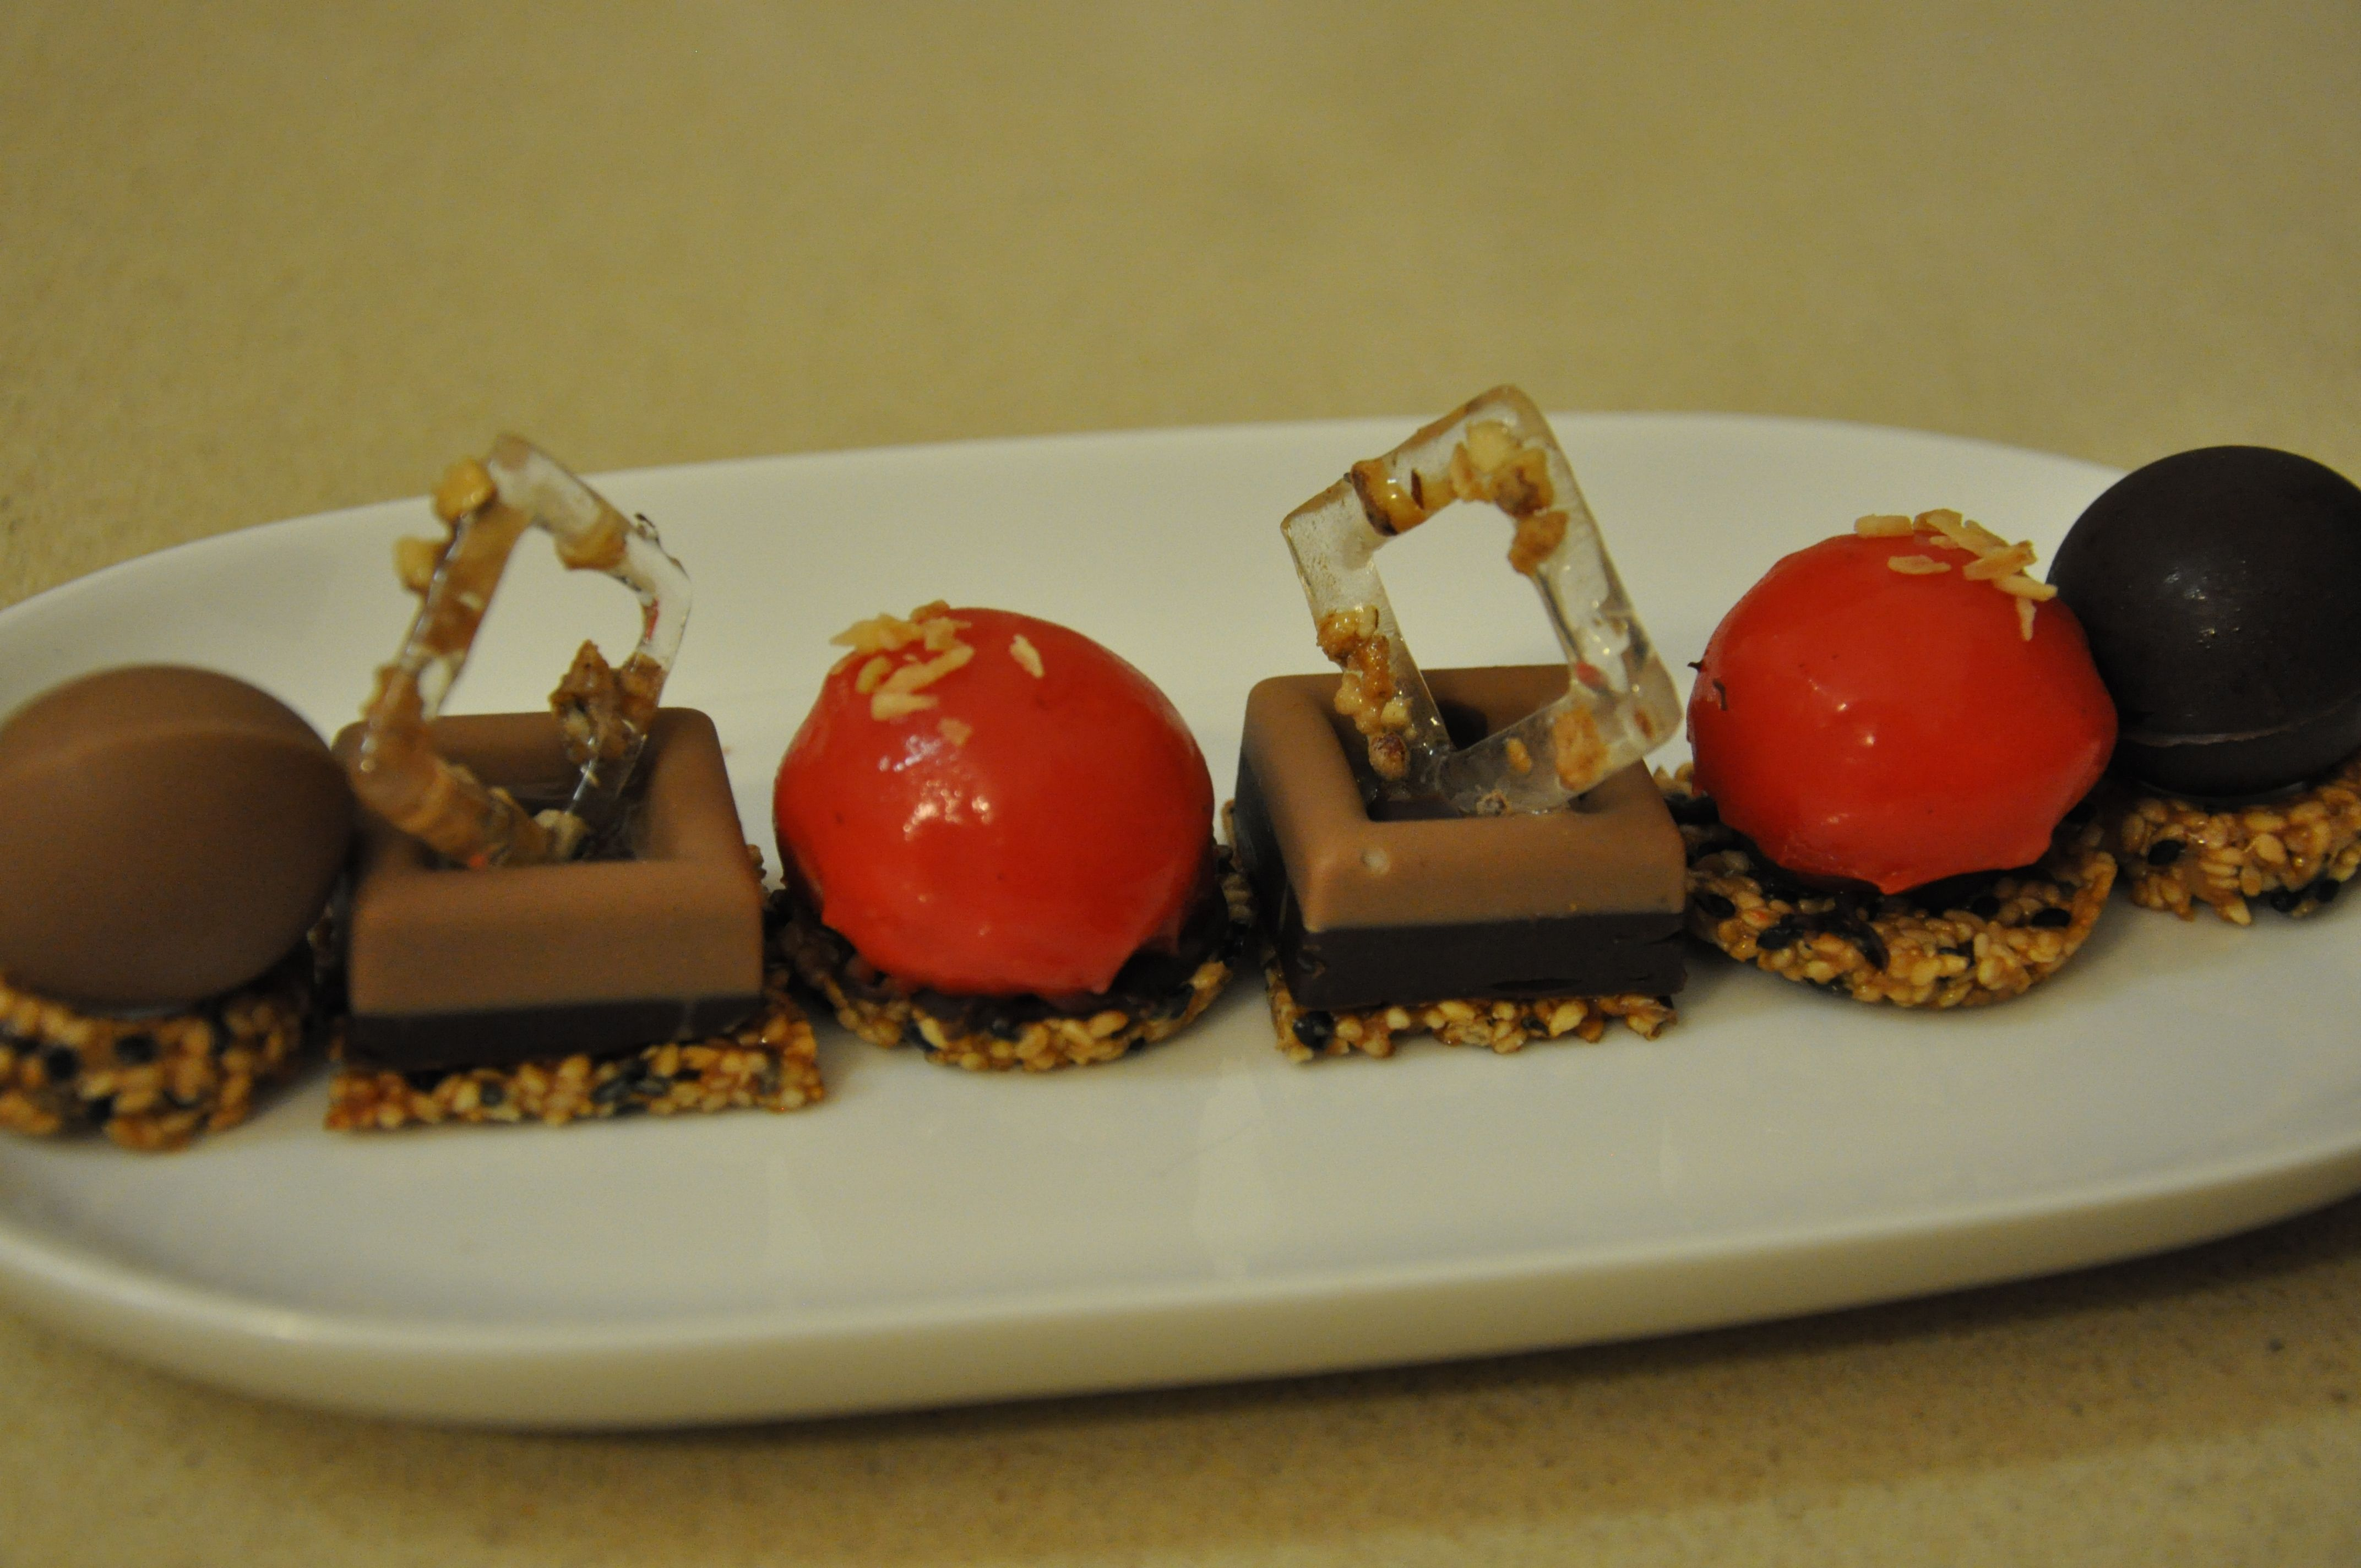 http://irischef.co.il/ שוקולדים קטנים ומשעהגים